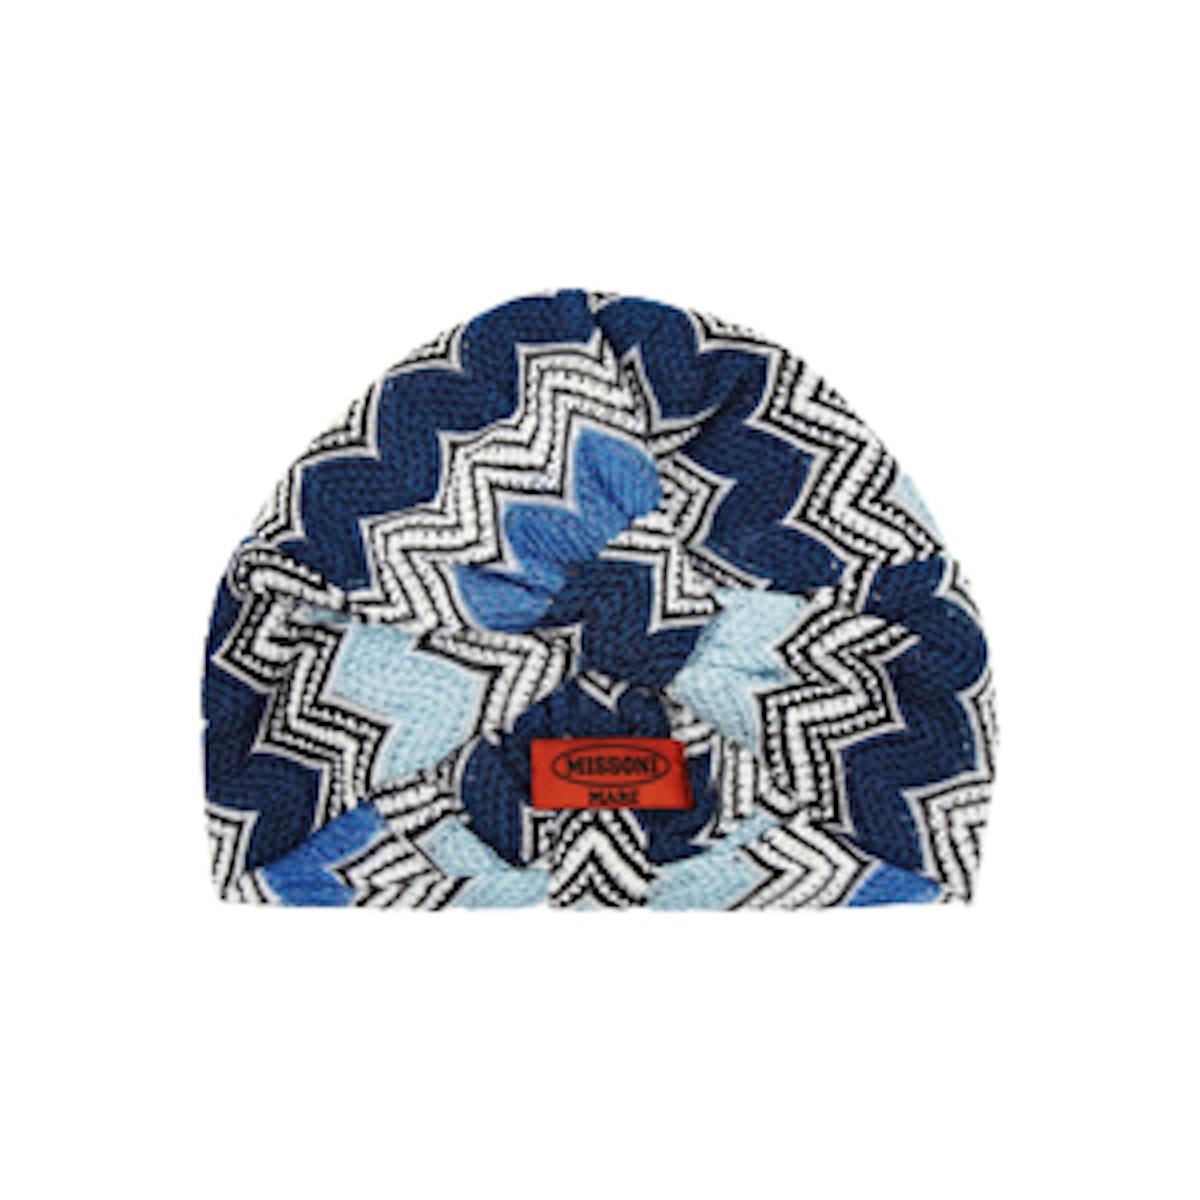 Metallic Crochet Knit Turban